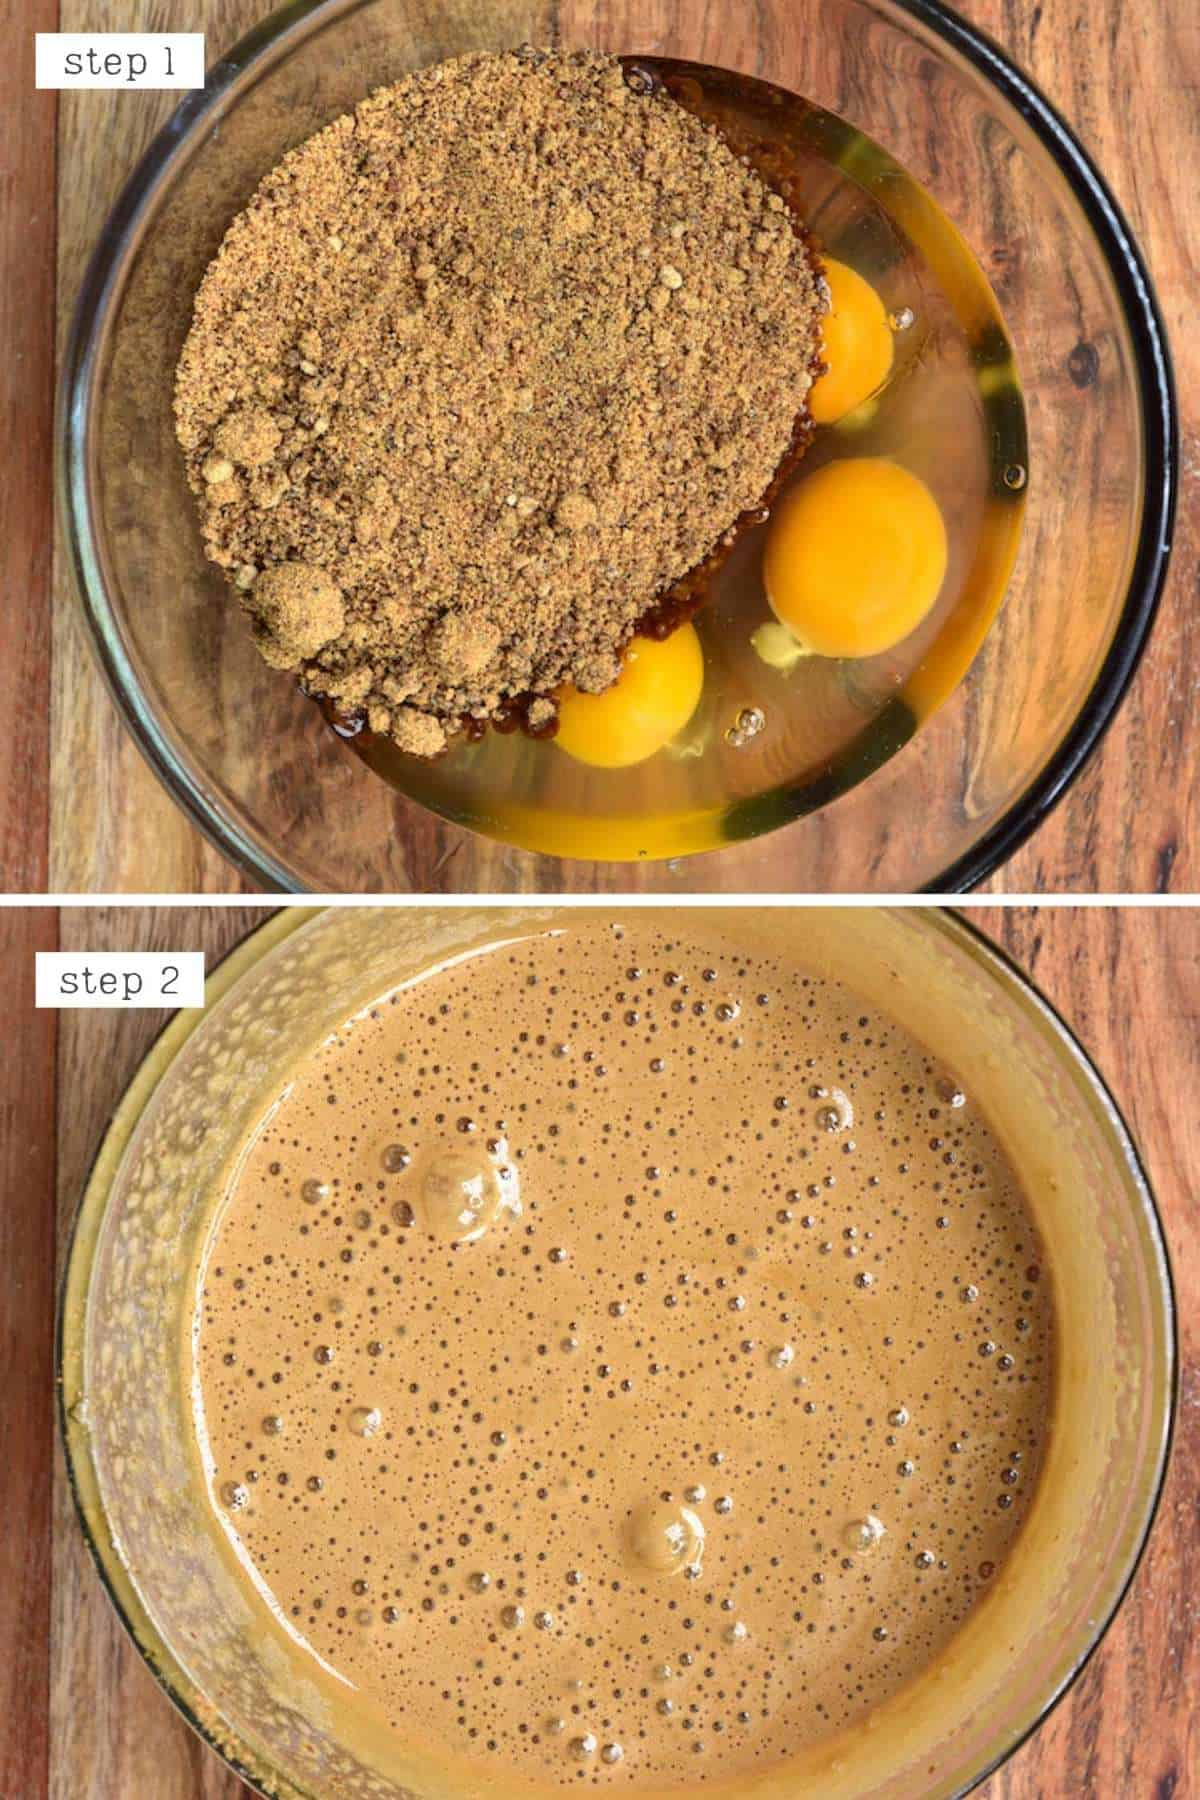 Mixing eggs and sugar